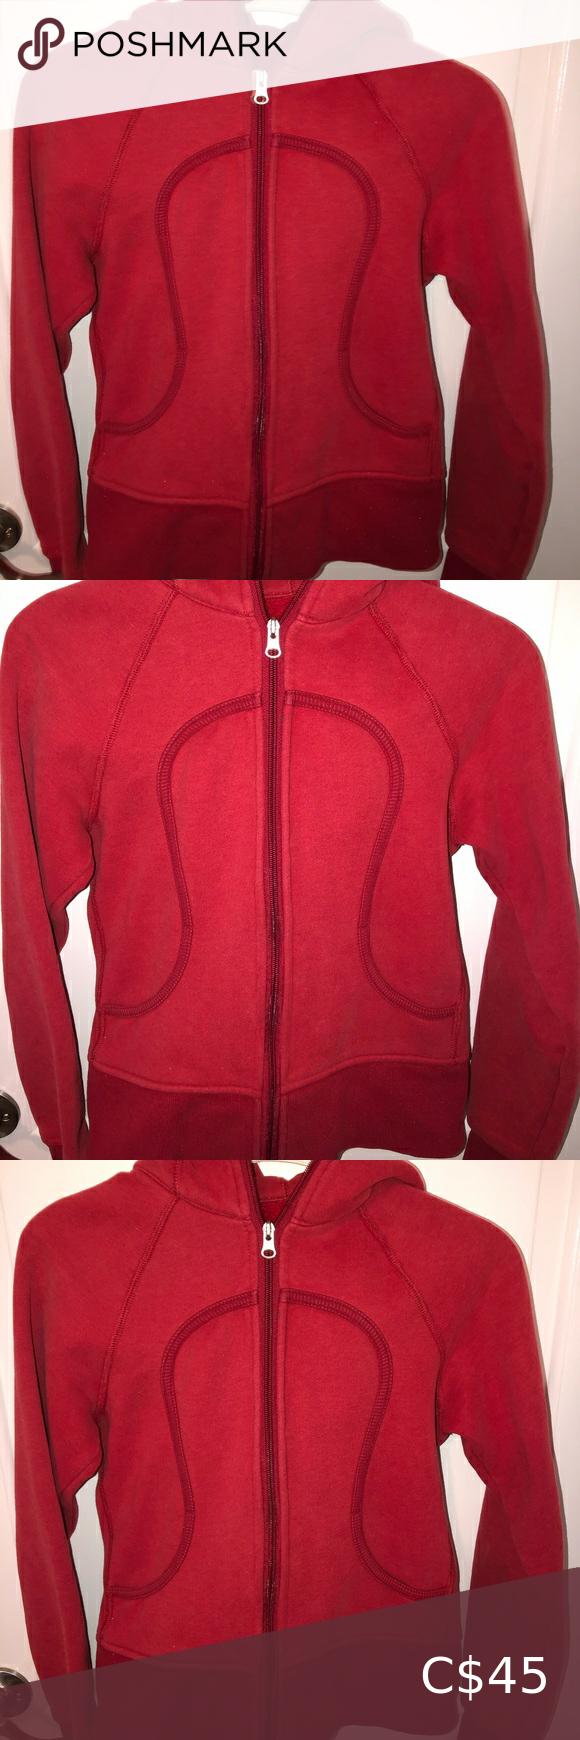 2/$45 Lululemon Women's Red Sweater Zip-Up Size 2